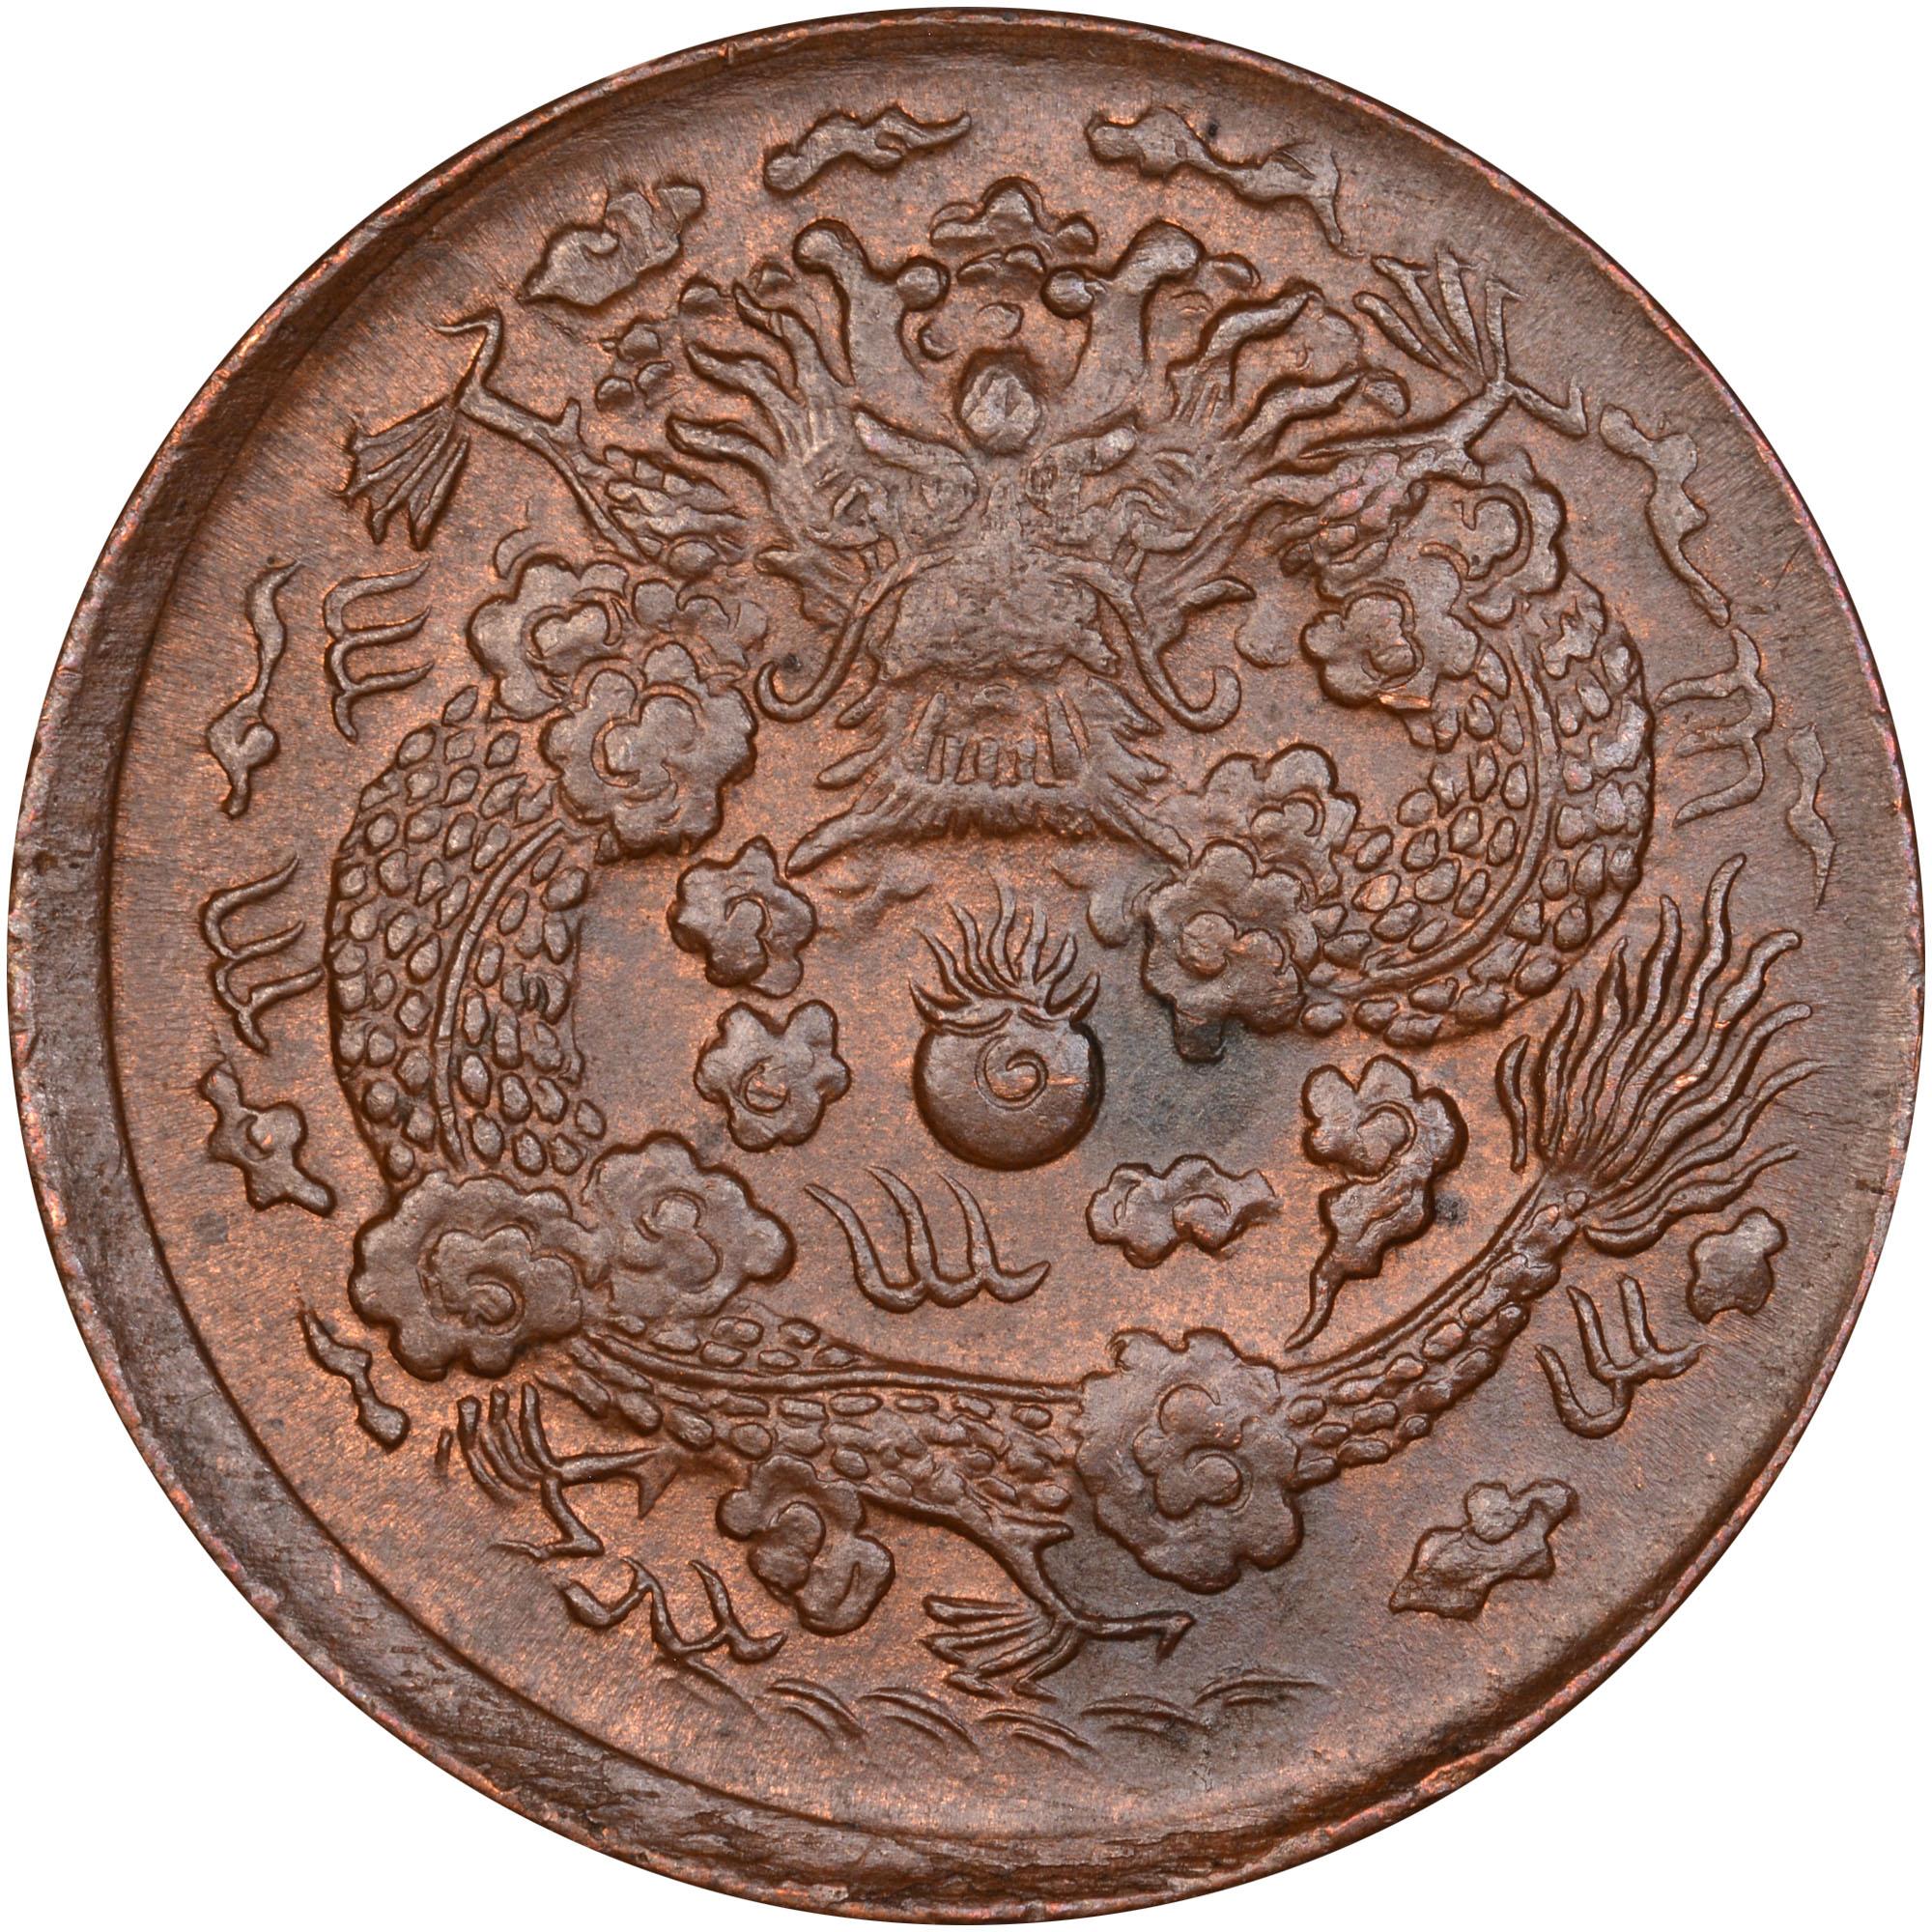 1907 China EMPIRE 2 Cash reverse